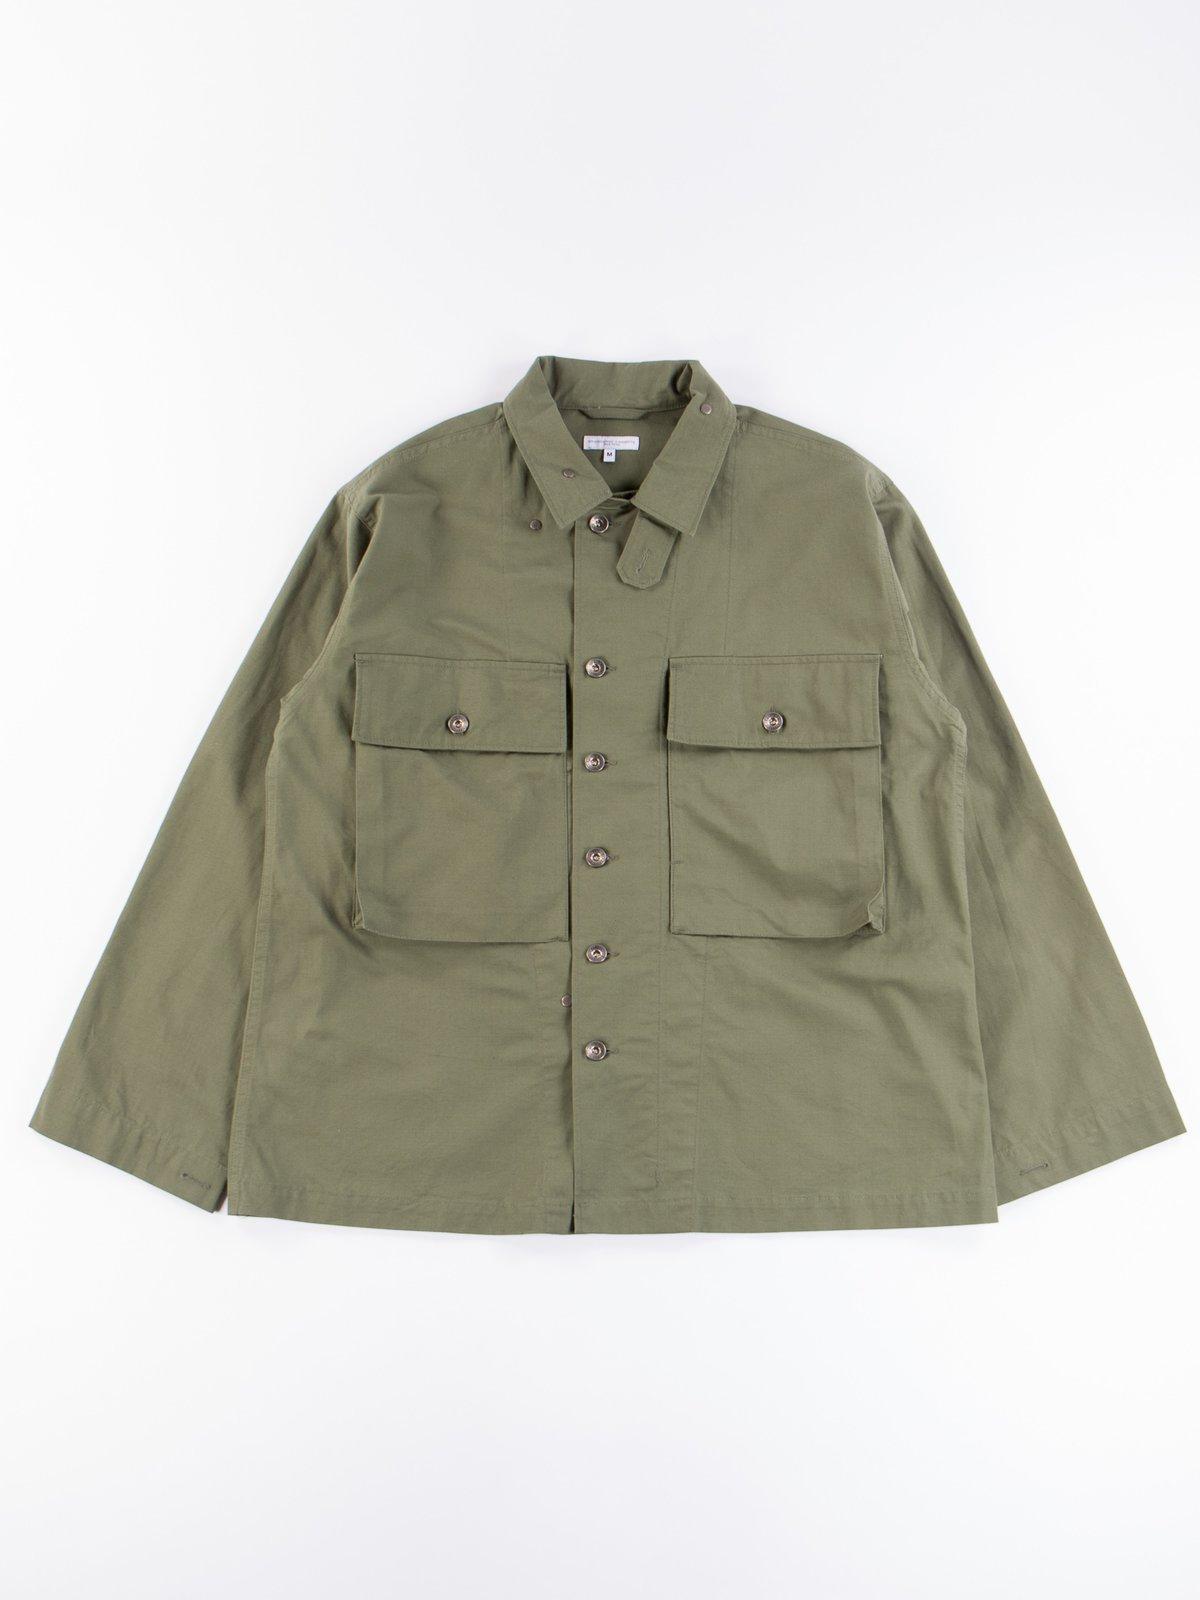 Olive Cotton Ripstop M43/2 Shirt Jacket - Image 1